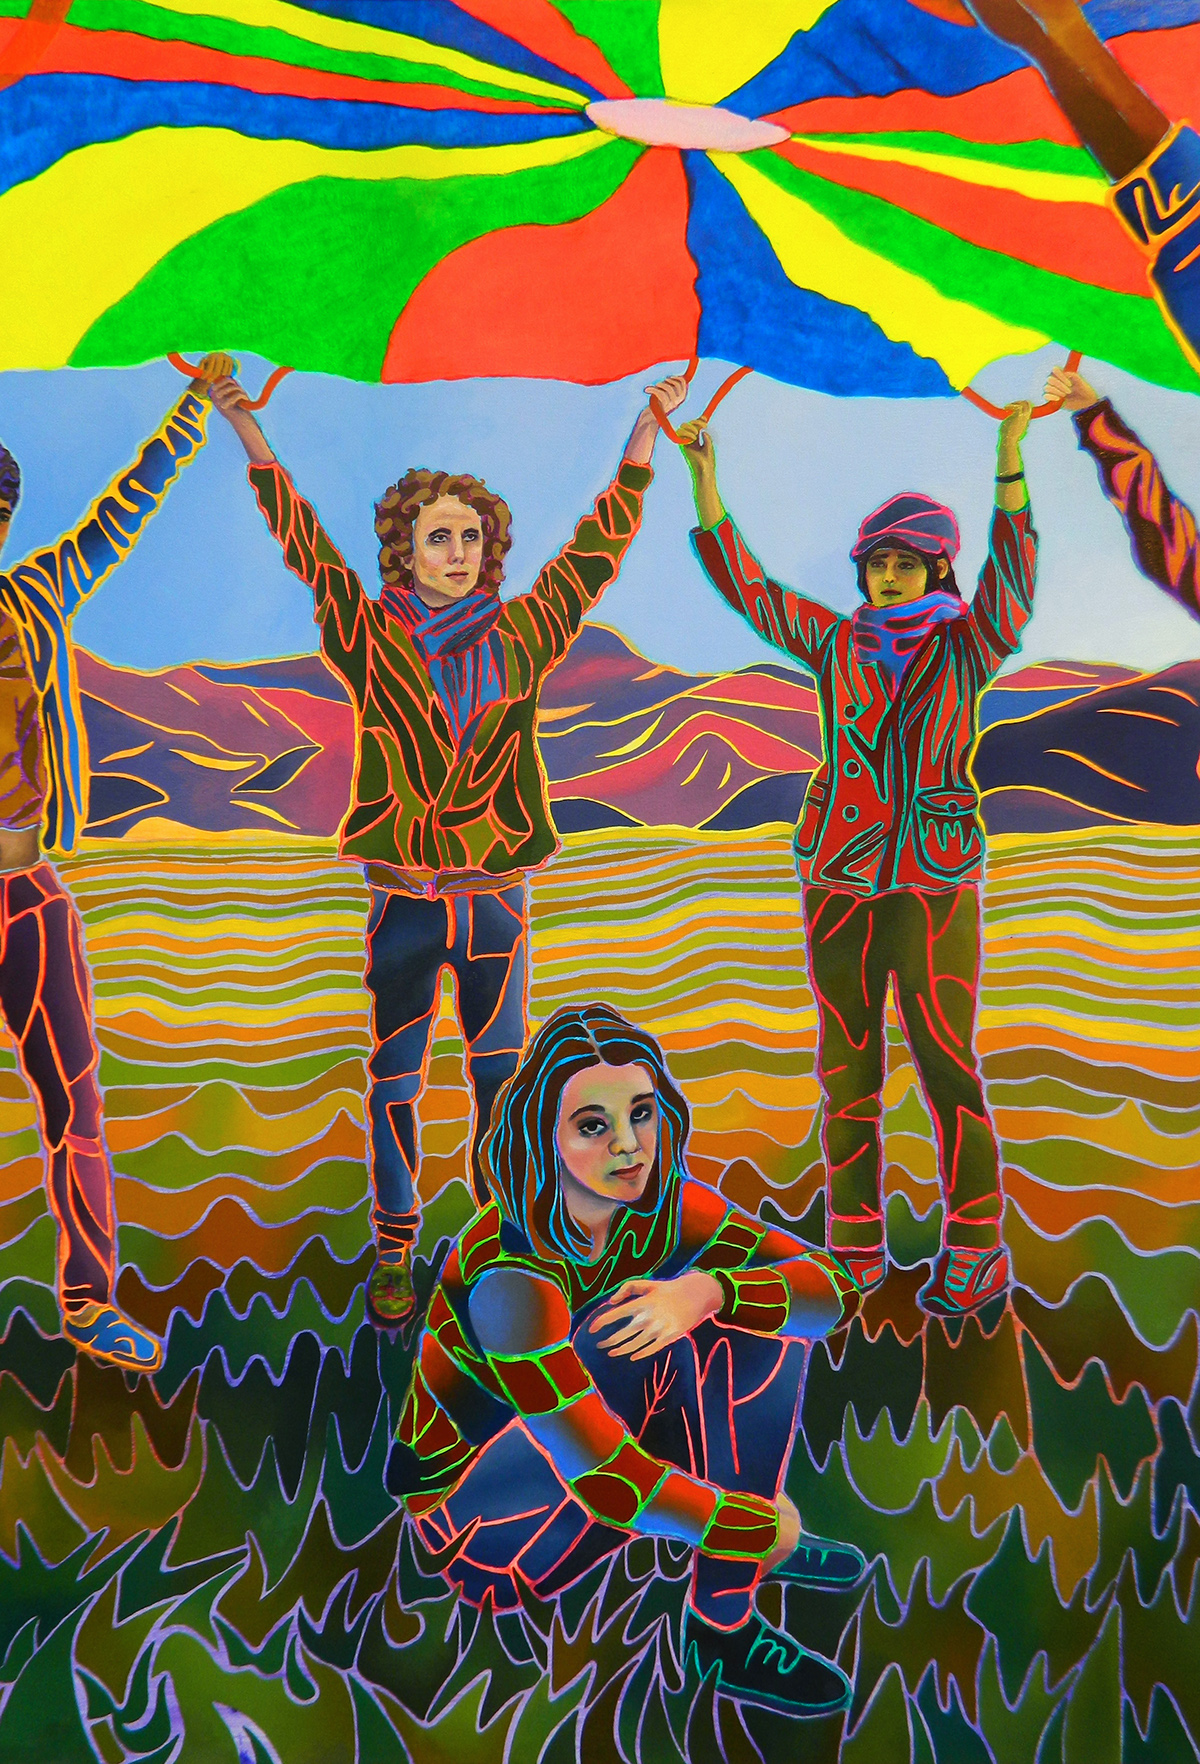 childhood lossofchildhood lossofinnocence innocence selfportrait figurative Illustrative detailed detail colorful maturation surreal hyperreal narrative identity